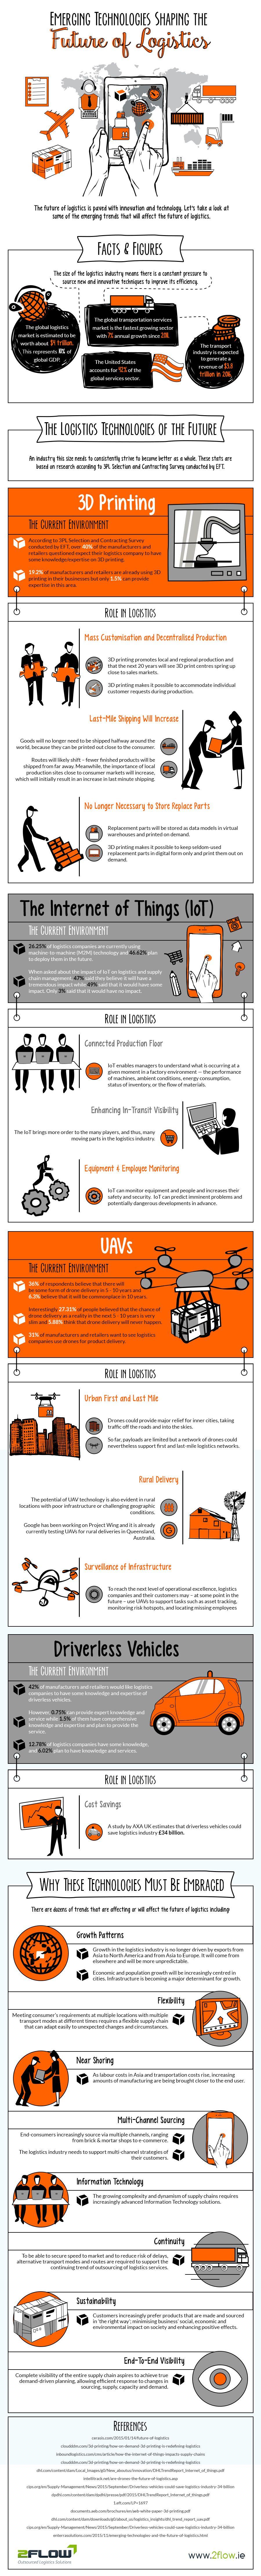 Emerging Technologies Shaping The Future Of Logistics Infographic Logistics Management Logistics Emerging Technology